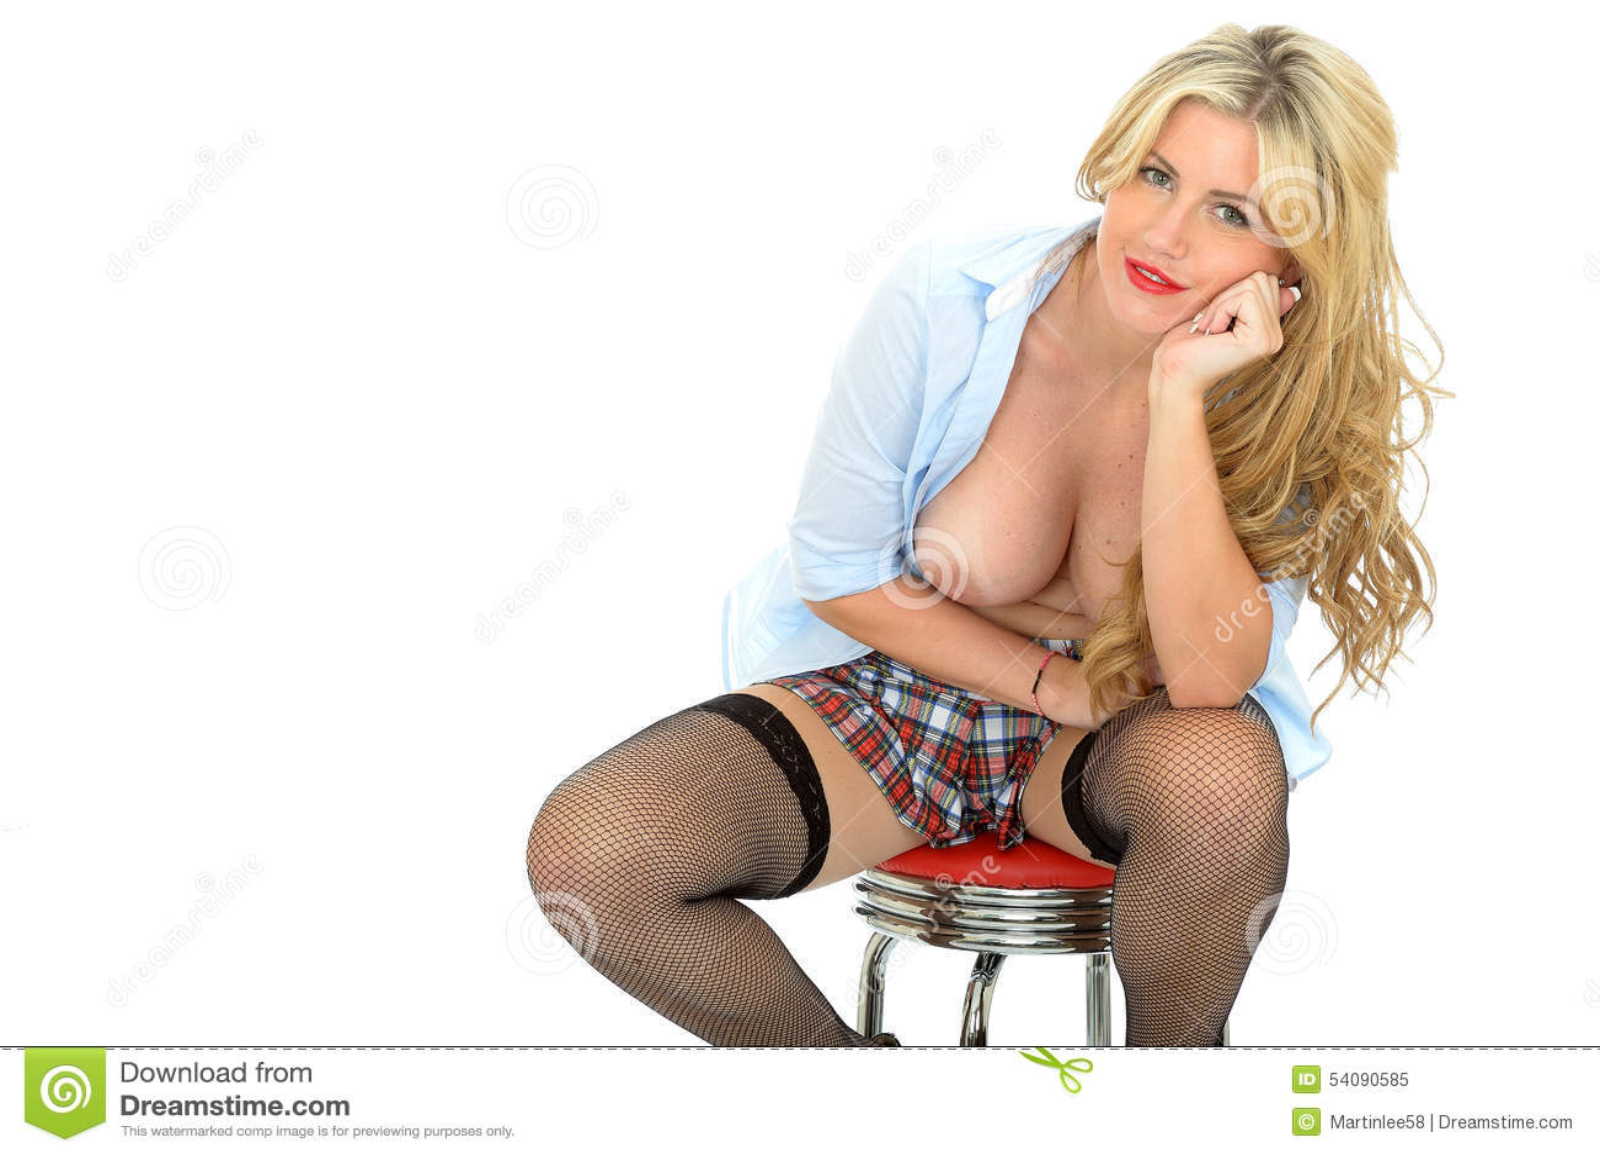 Beau jeune Pin Up Model Posing Topless blond classique coquet effronté sexy